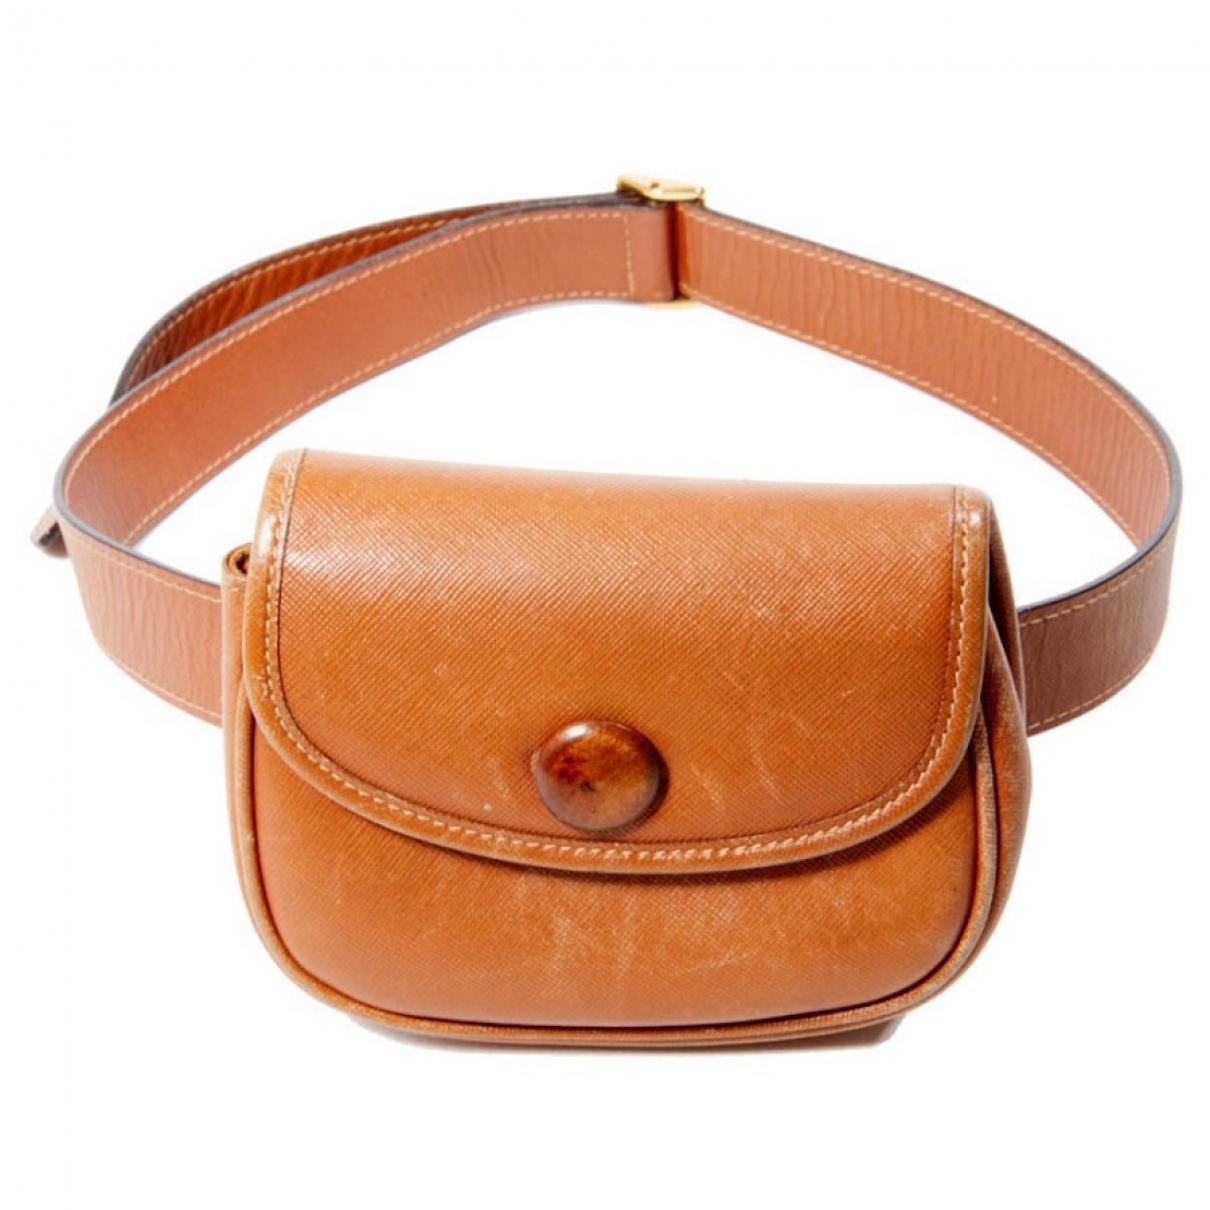 Gucci \N Camel Leather Clutch bag for Women \N